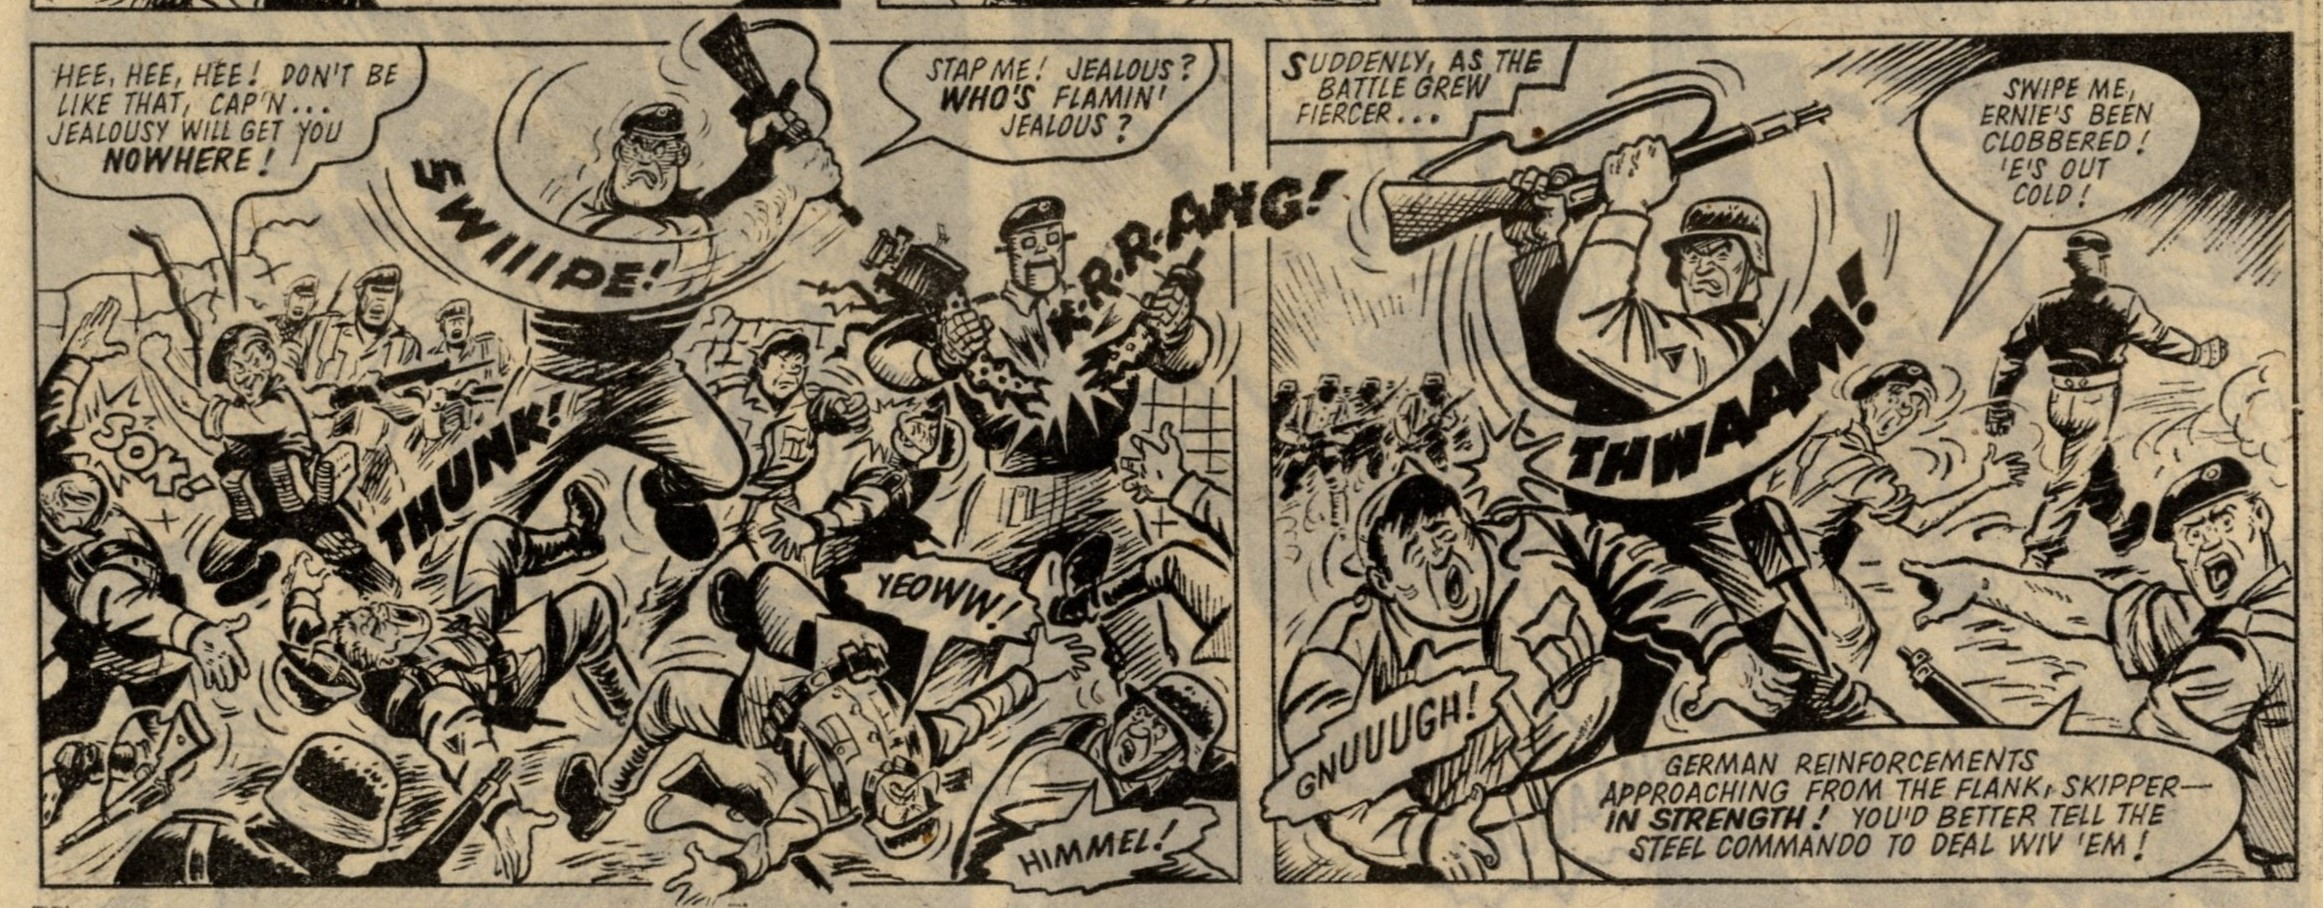 Captain Hurricane Meets Steel Commando: Charles Roylance (artist)